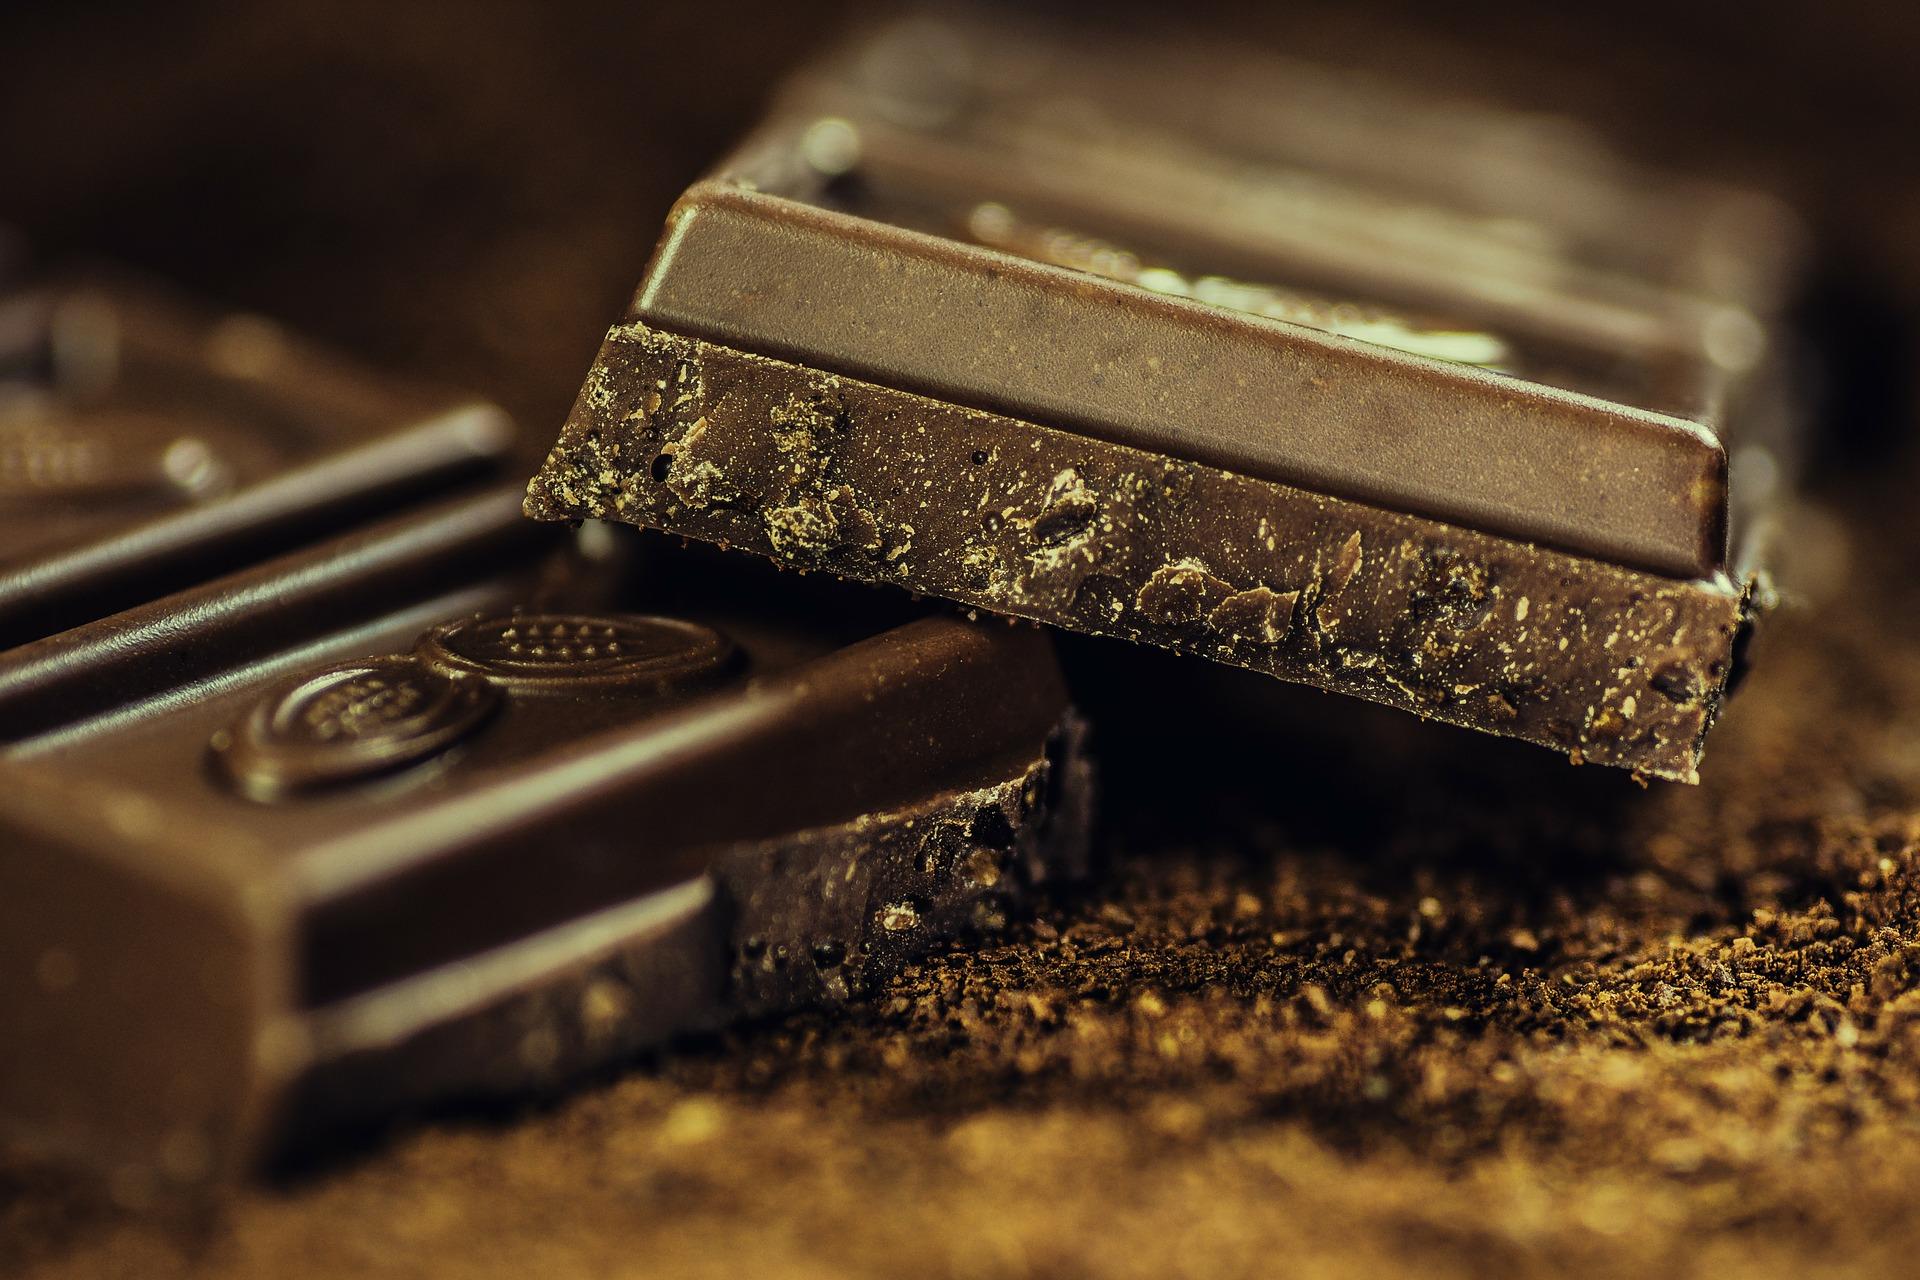 york chocolate story, chocolate story york, the chocolate story york, york chocolate story voucher, york chocolate story prices